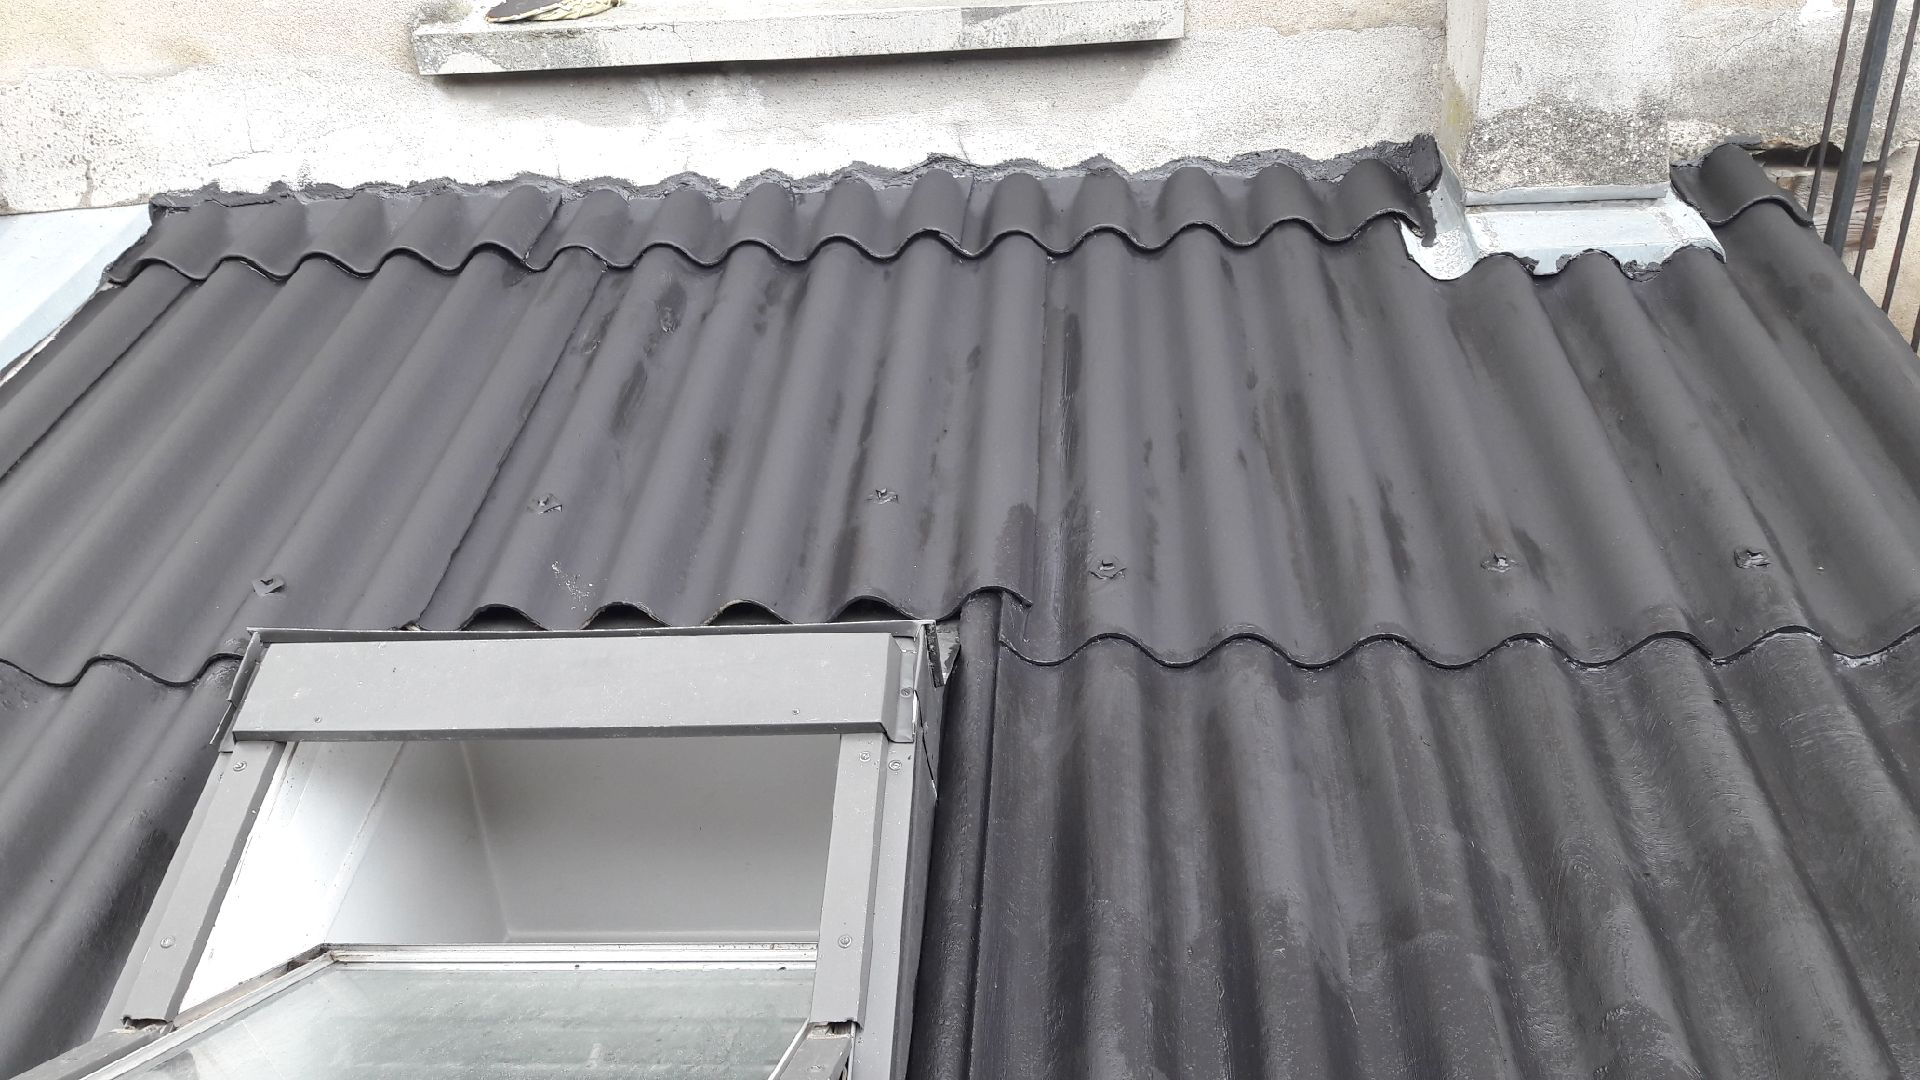 nettoyage-de-toiture-Corne-49630